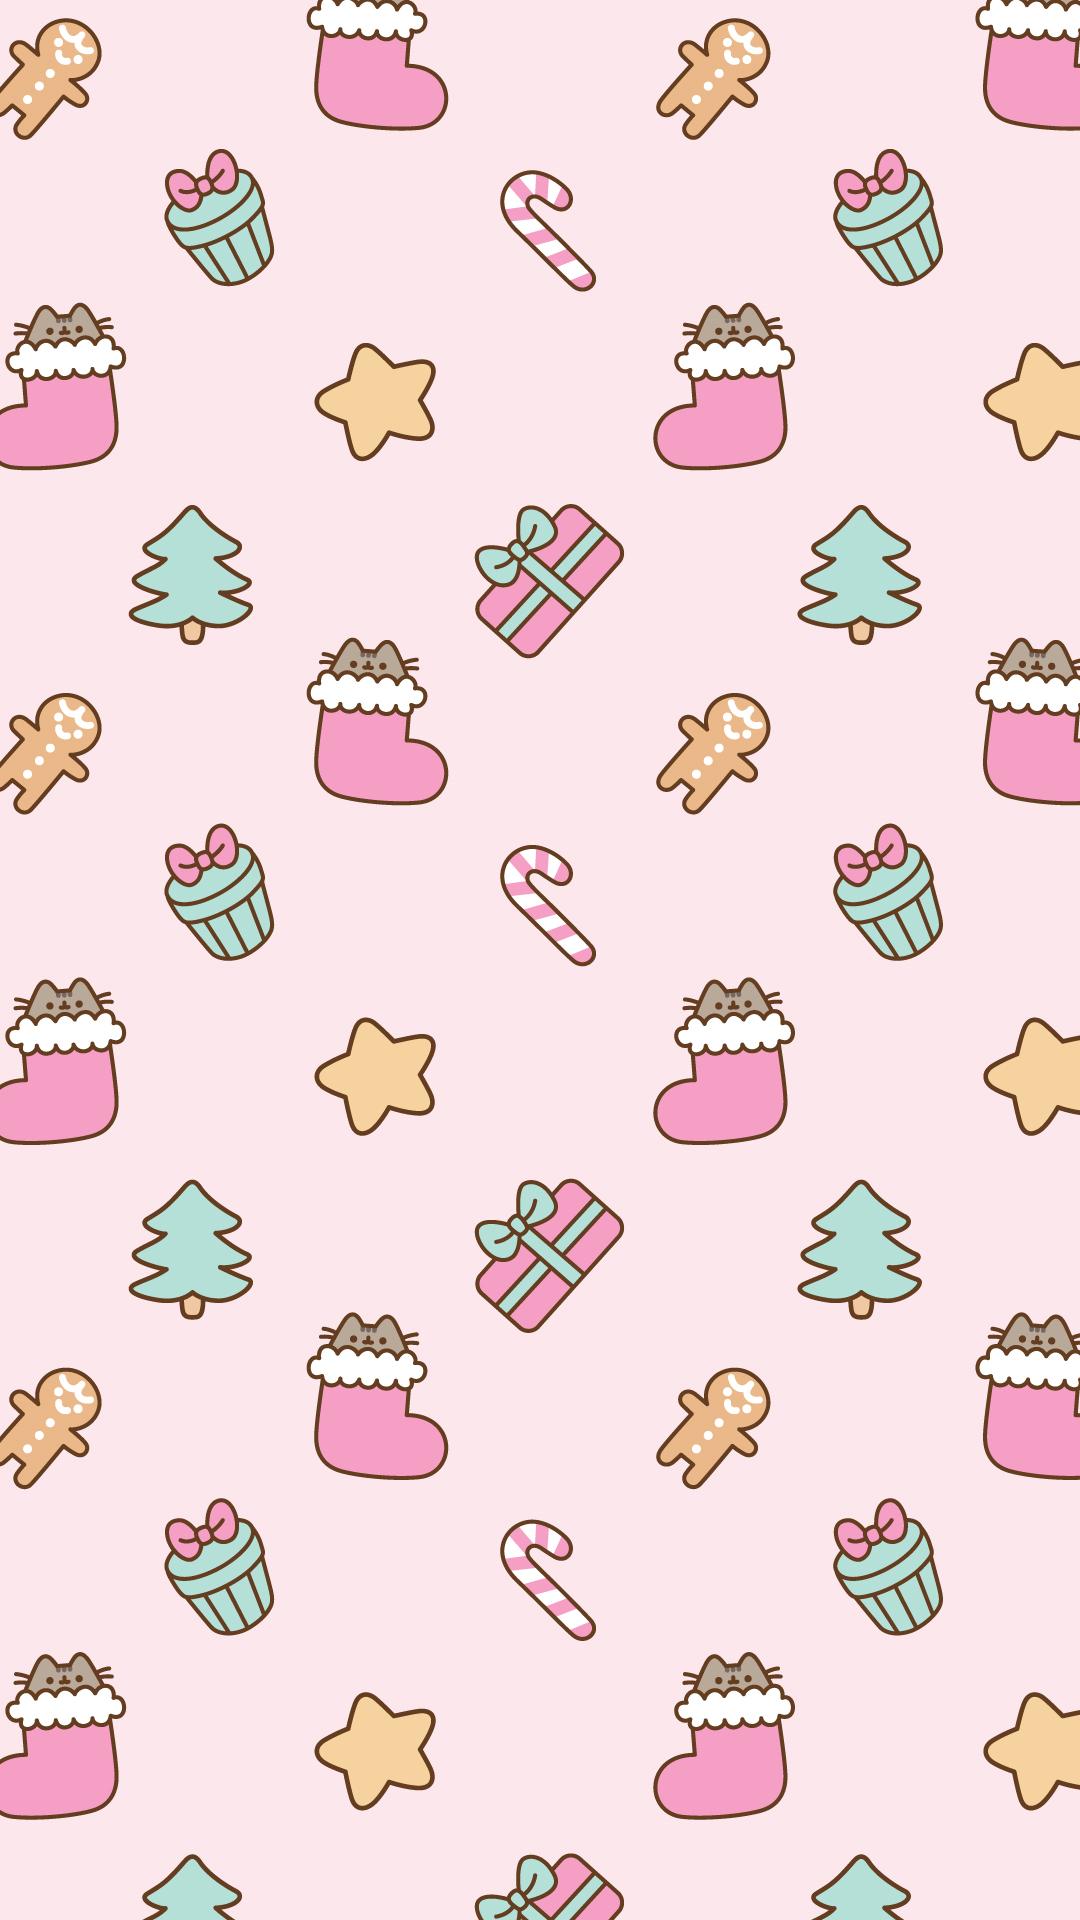 Disney Cute Kawaii Wallpaper Free Christmas Pusheen Android And Iphone 174 Wallpapers